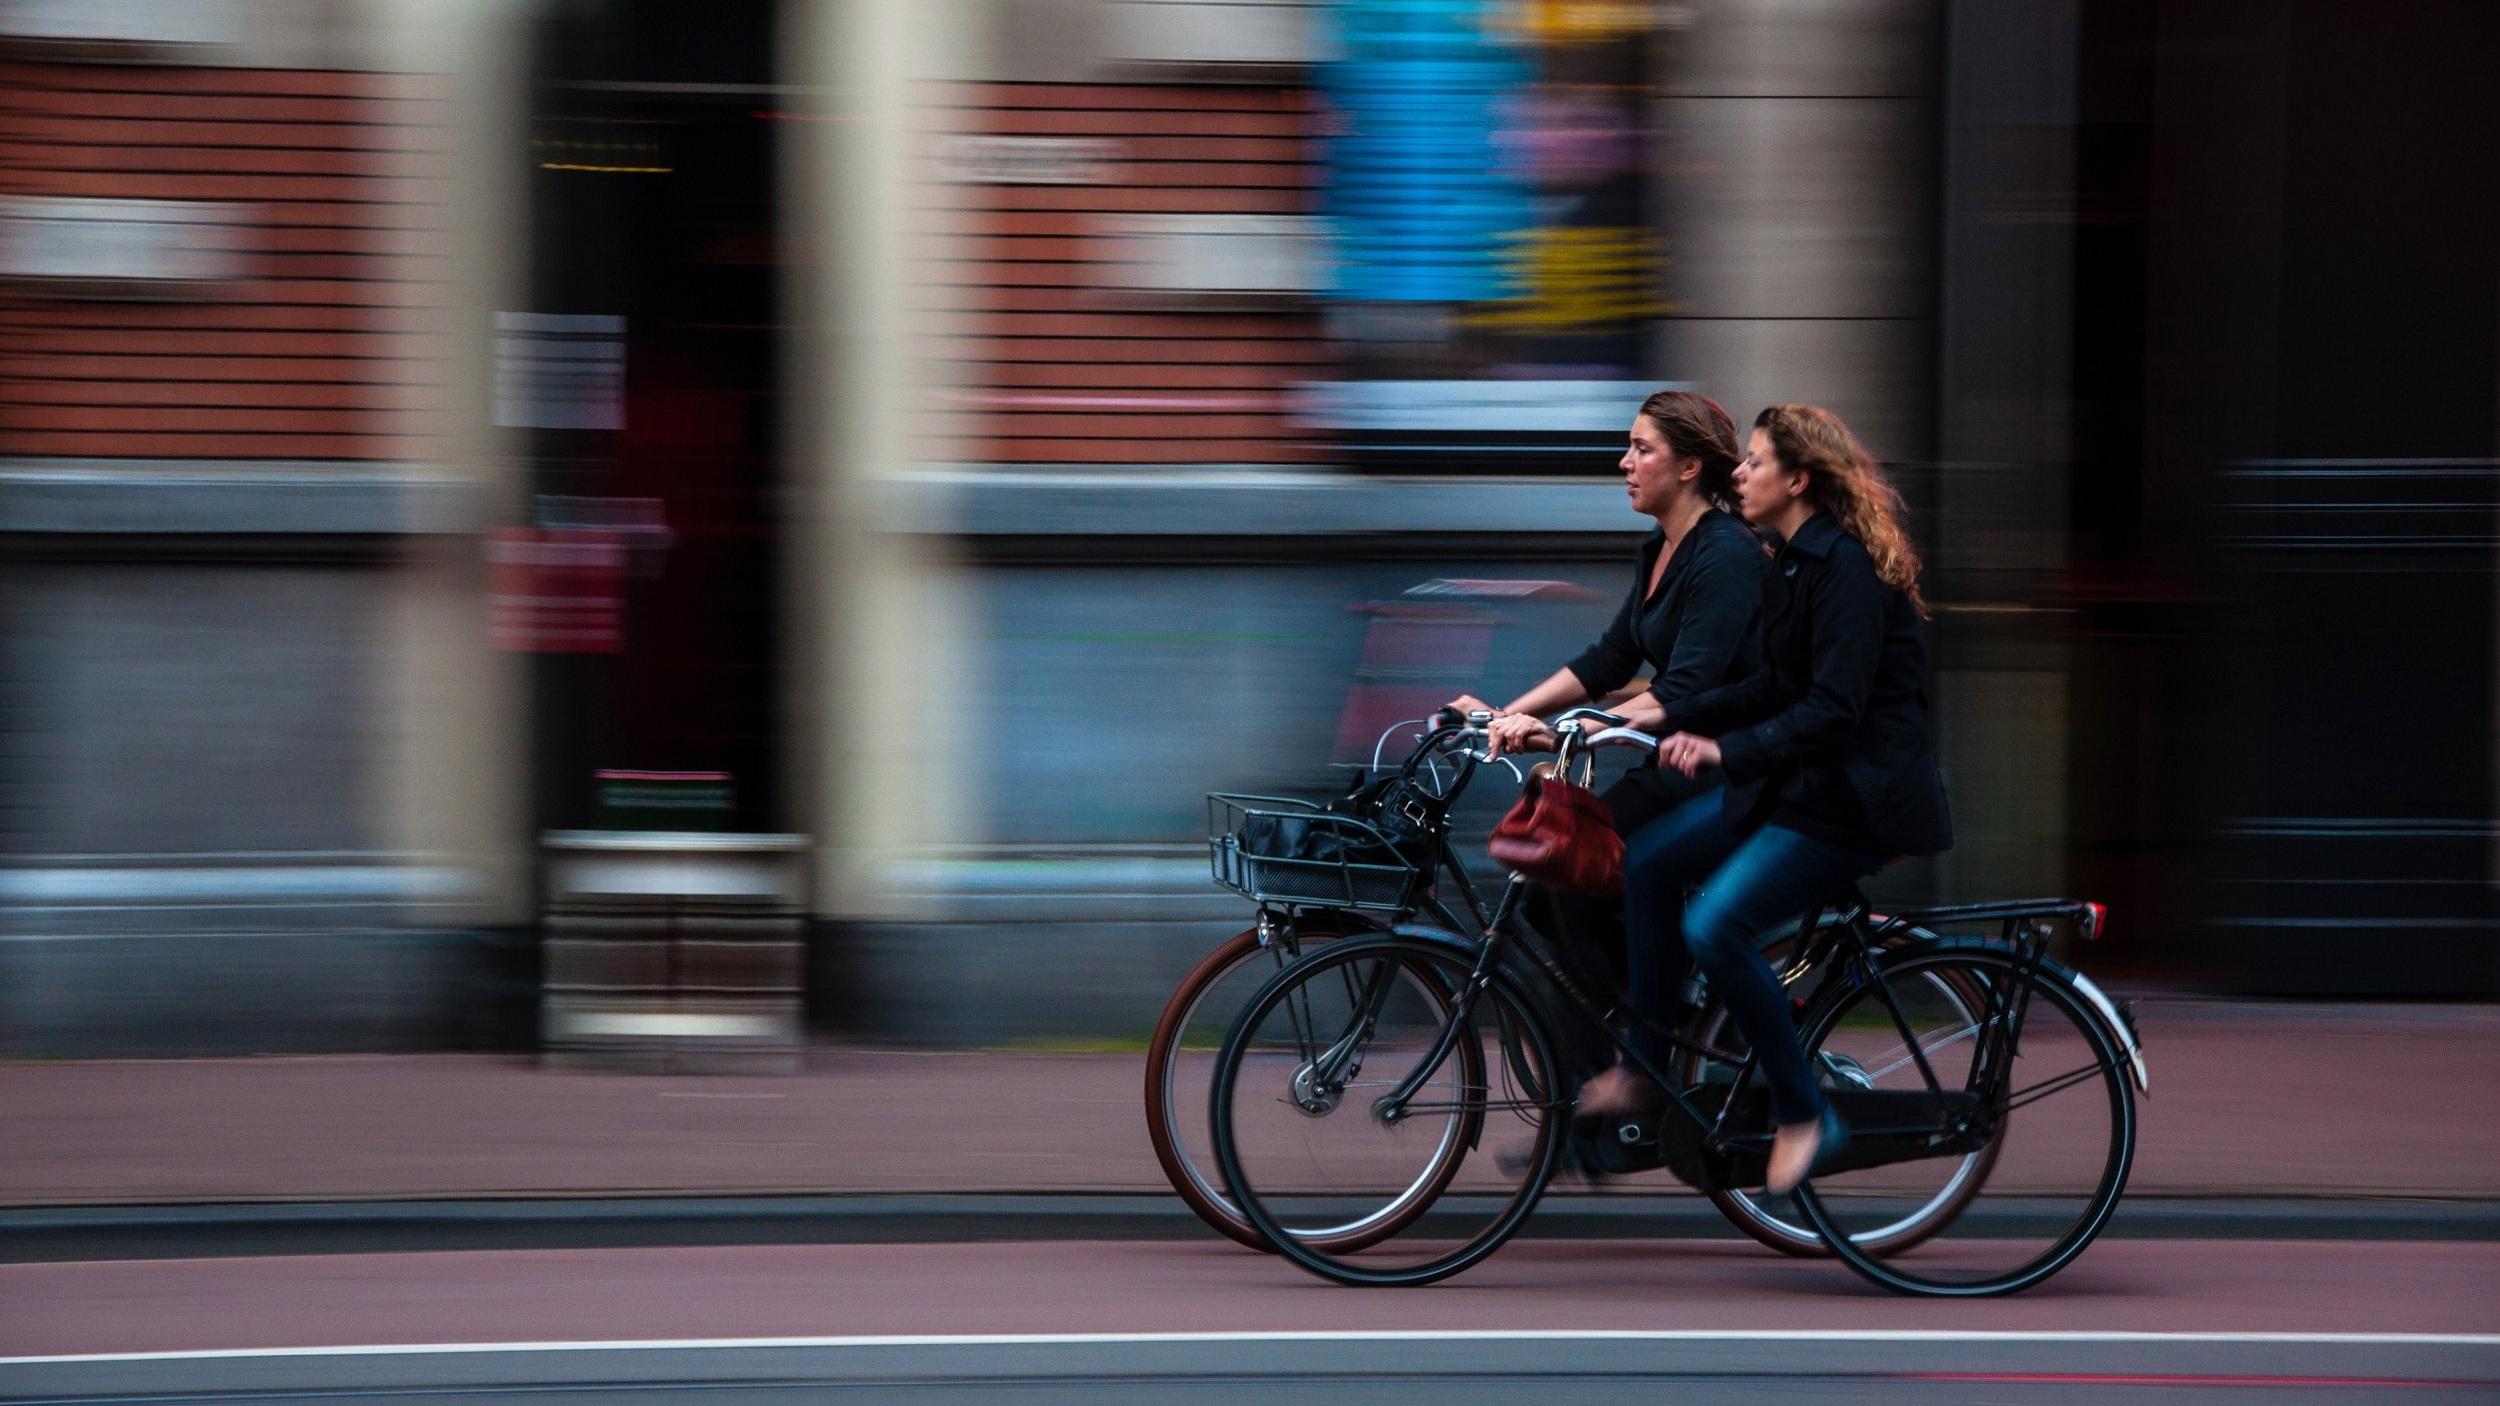 Bike Sharing to help the environment